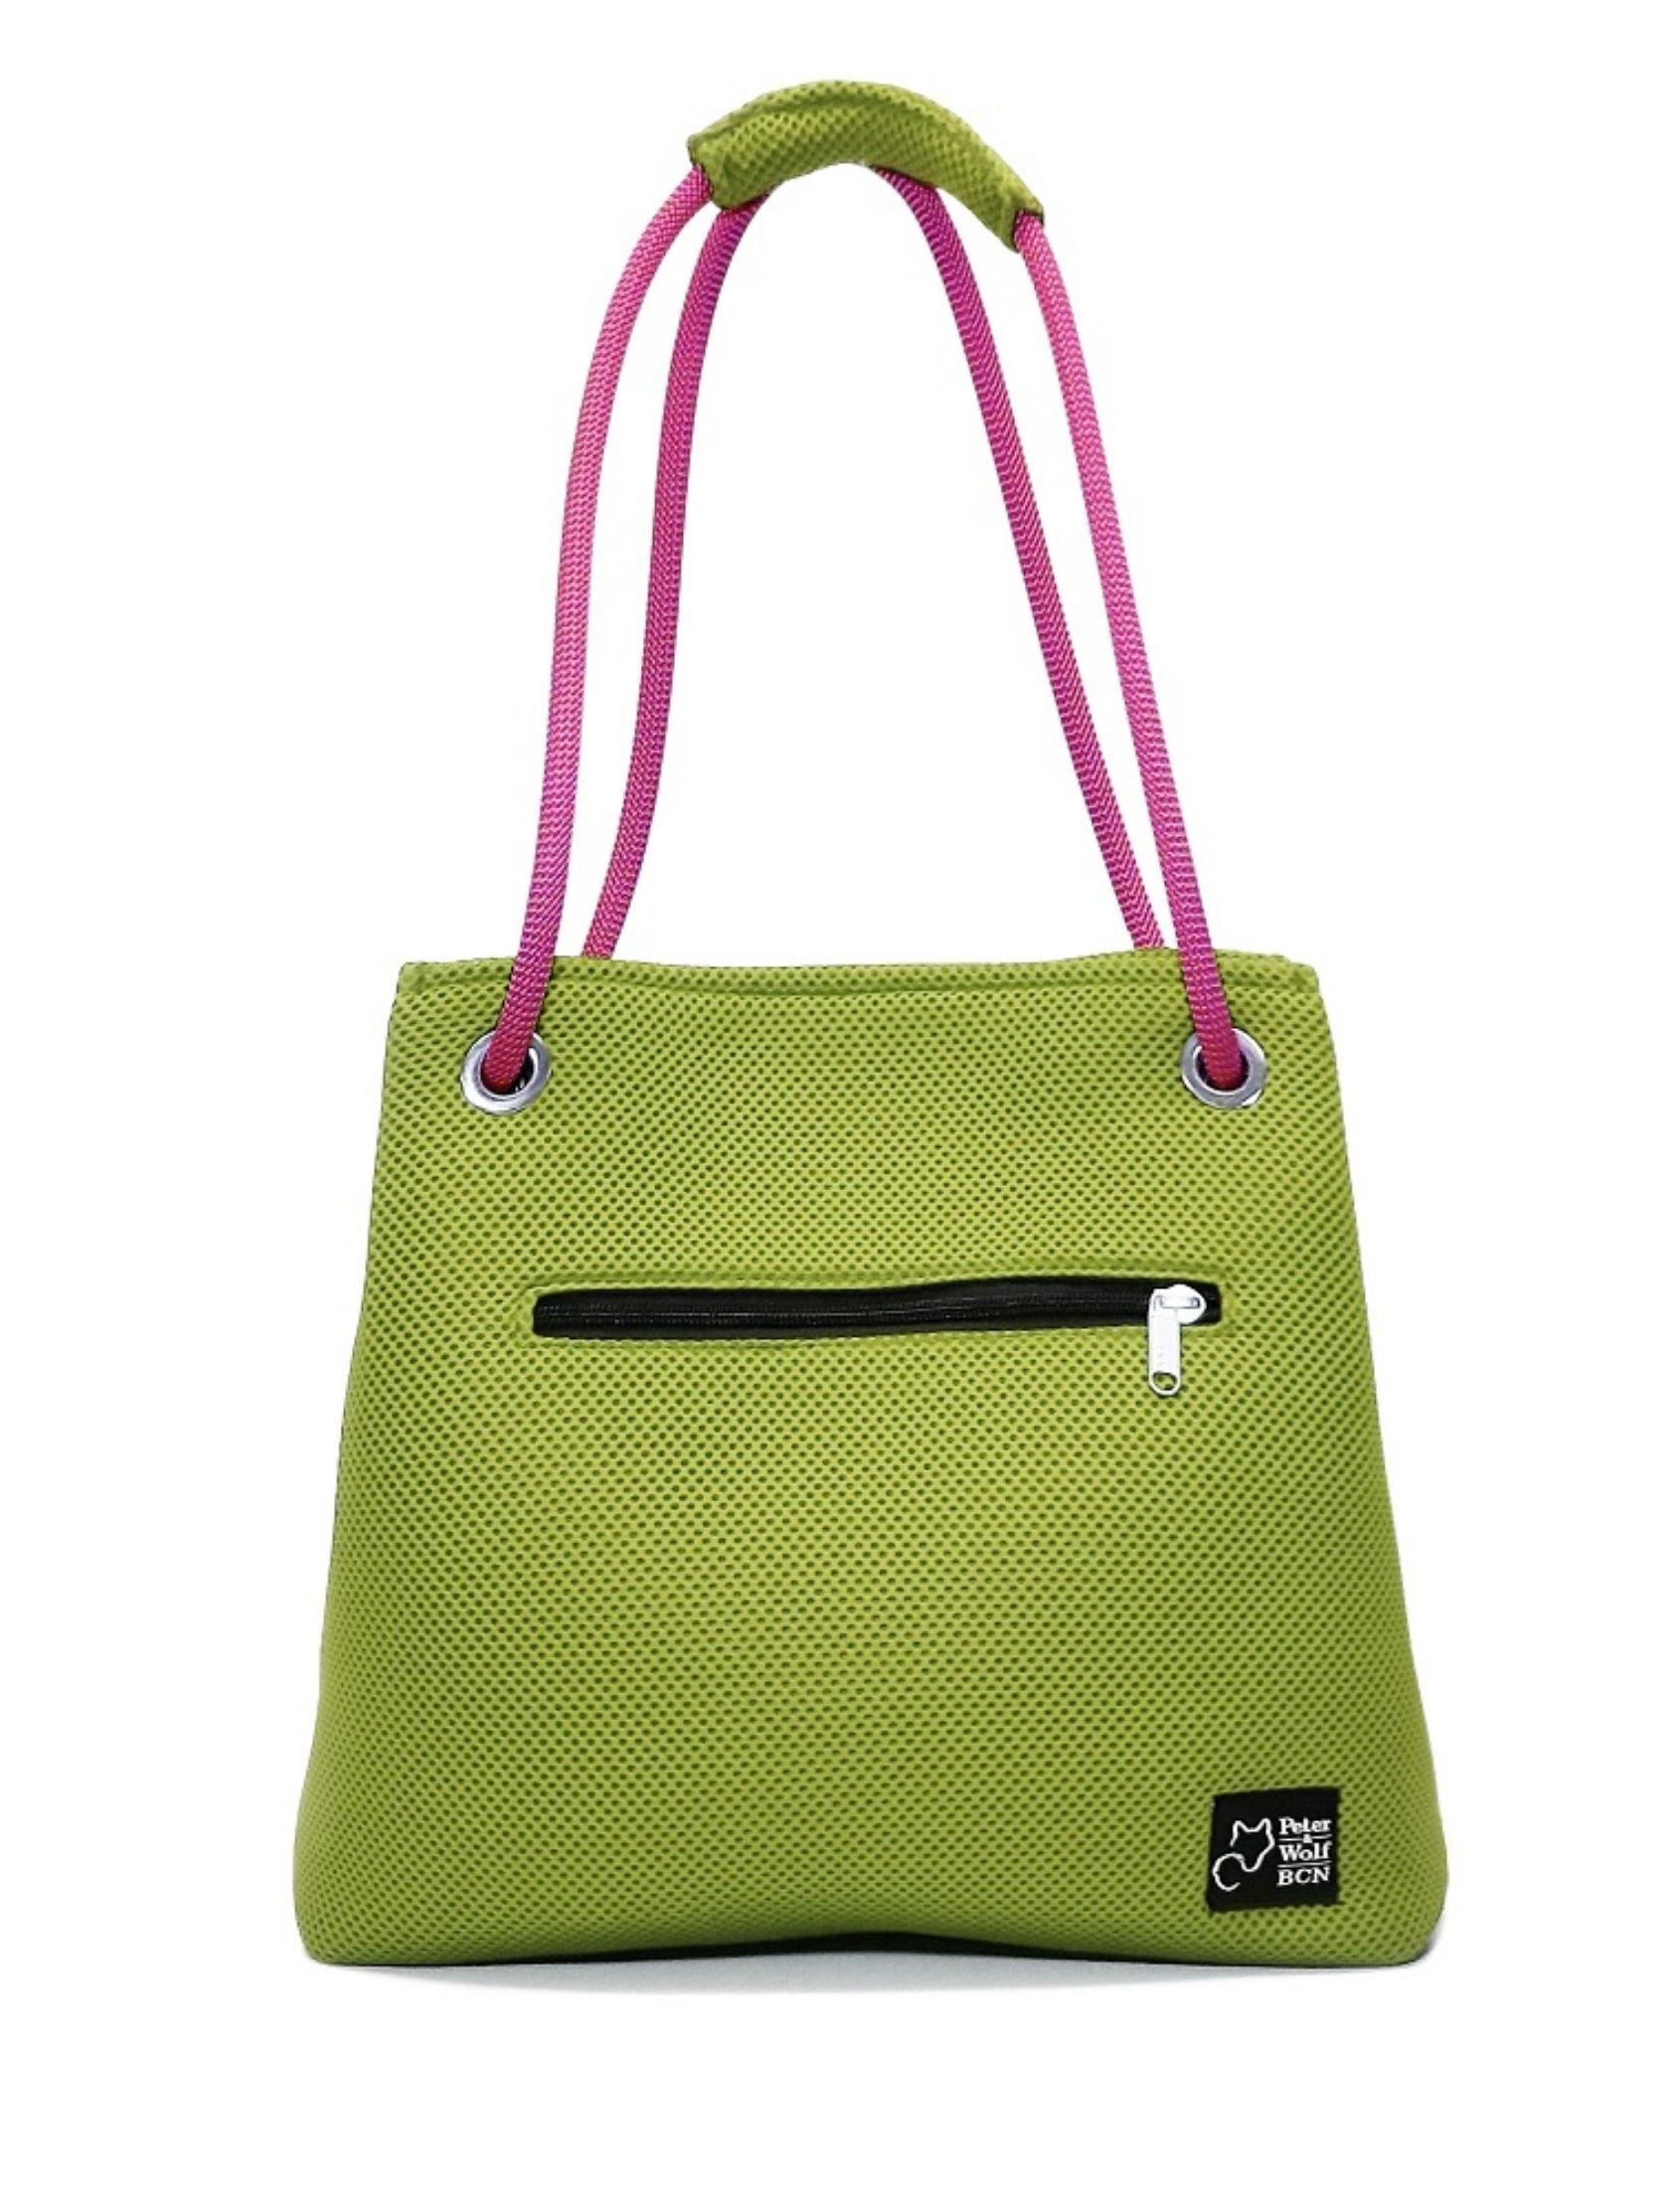 Bolso en tejido 3d tono verde pistacho con asa de cuerda de escalar fucsia